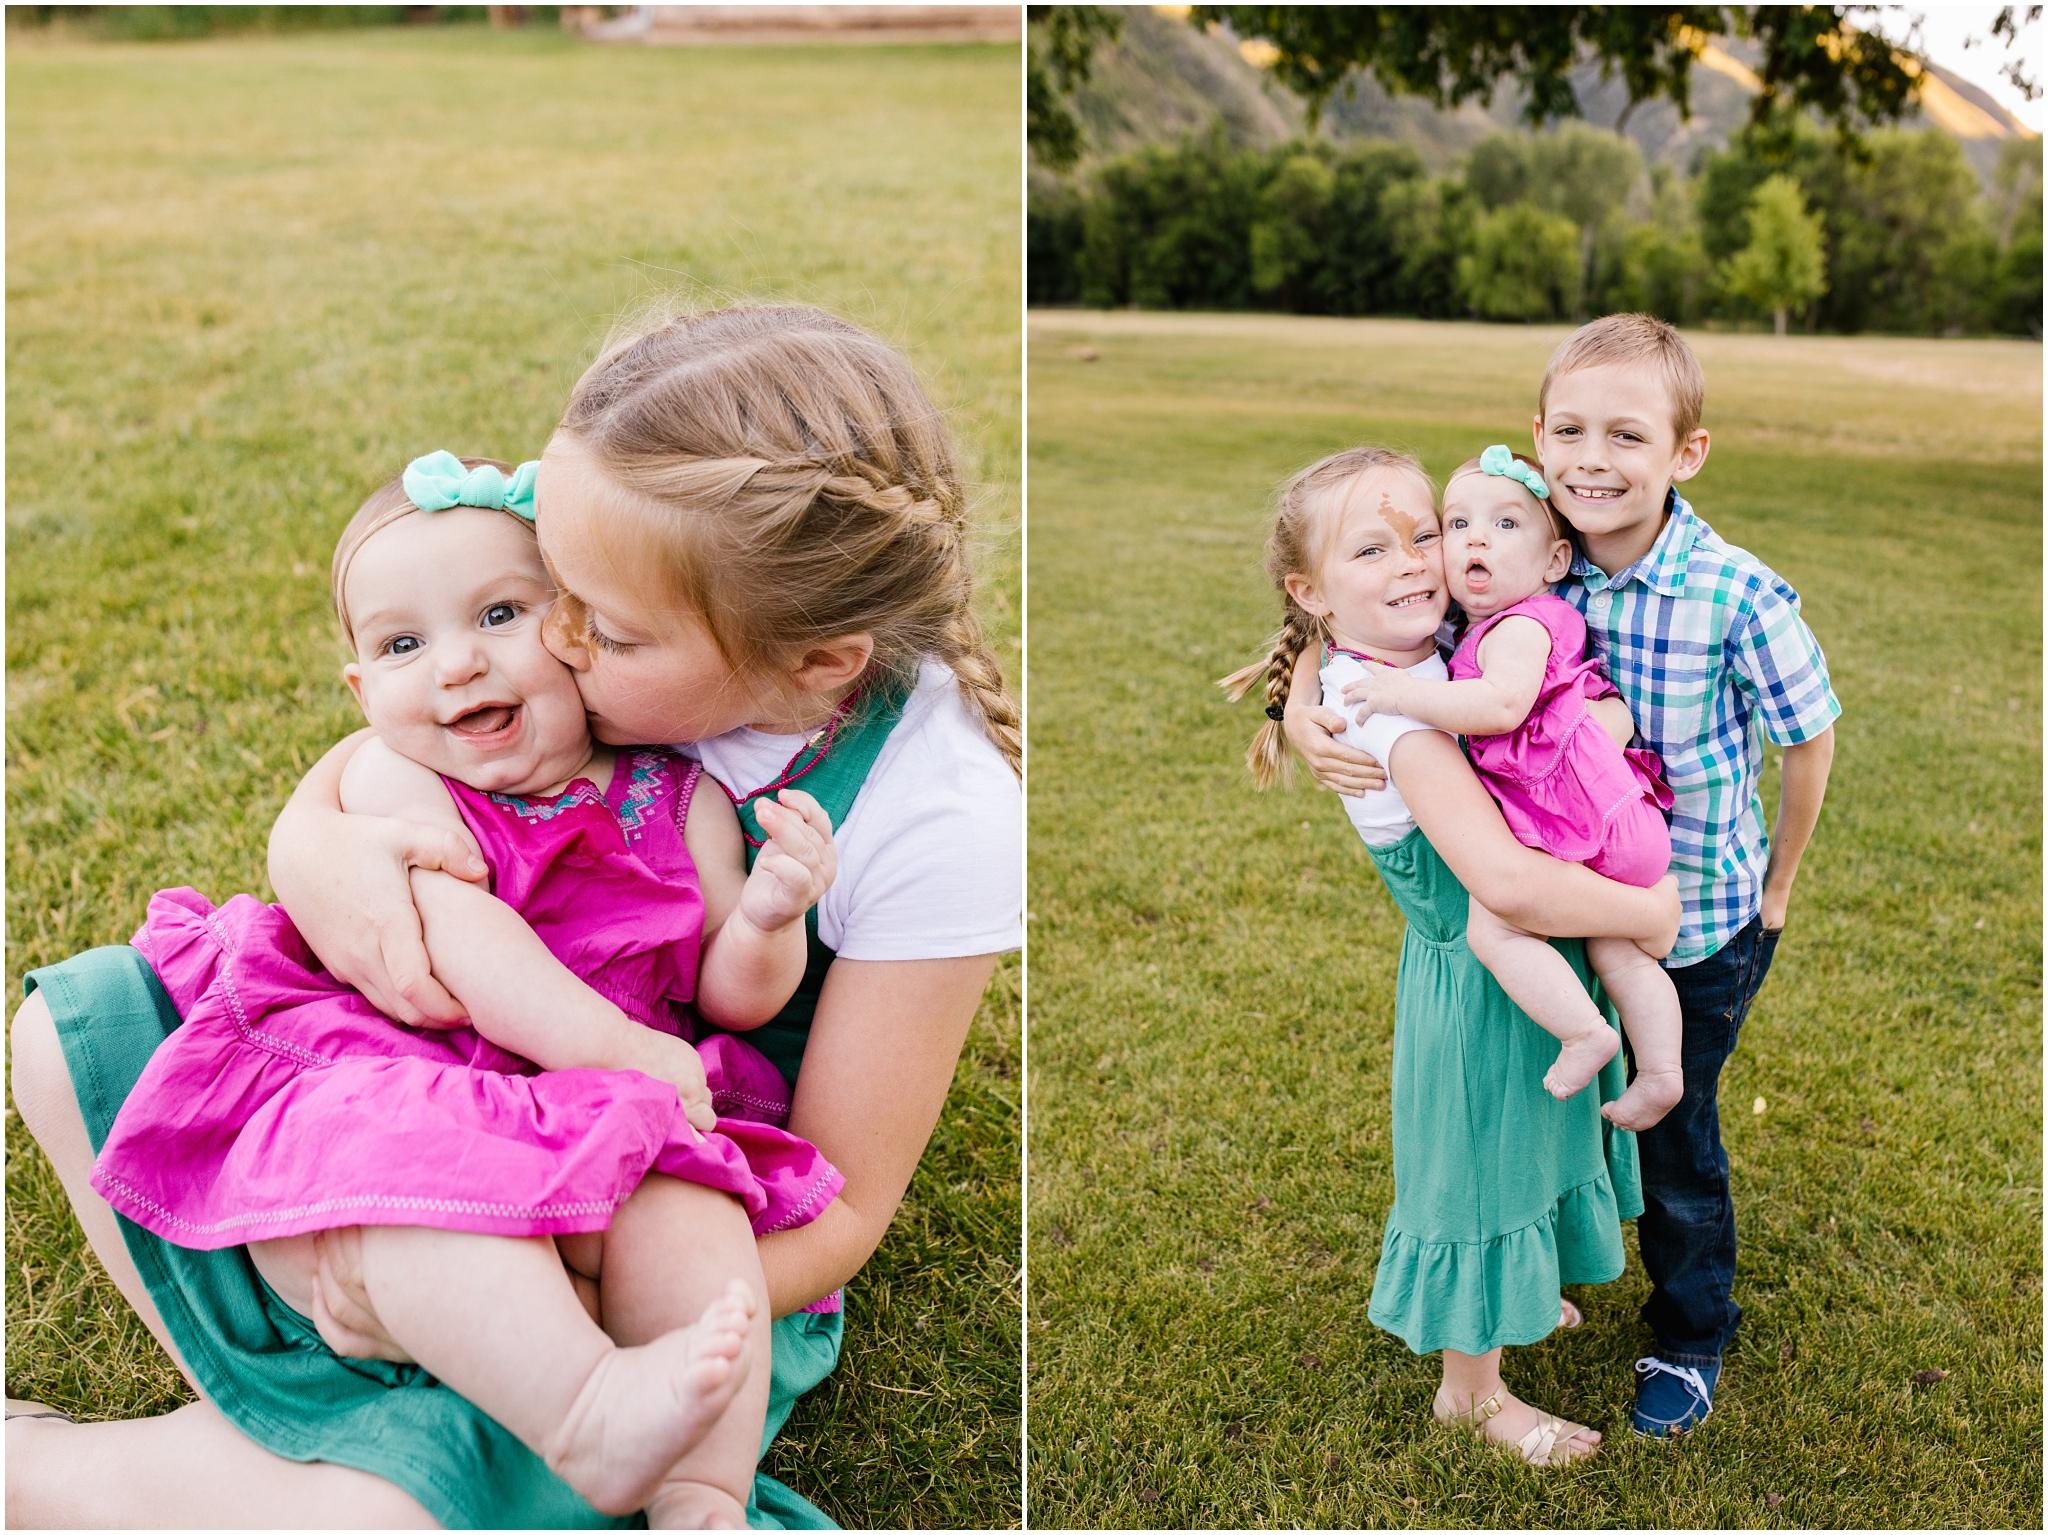 Lizzie-B-Imagery-Utah-Family-Photographer-Utah-County-Photographer-Hobble-Creek-Canyon_0025.jpg